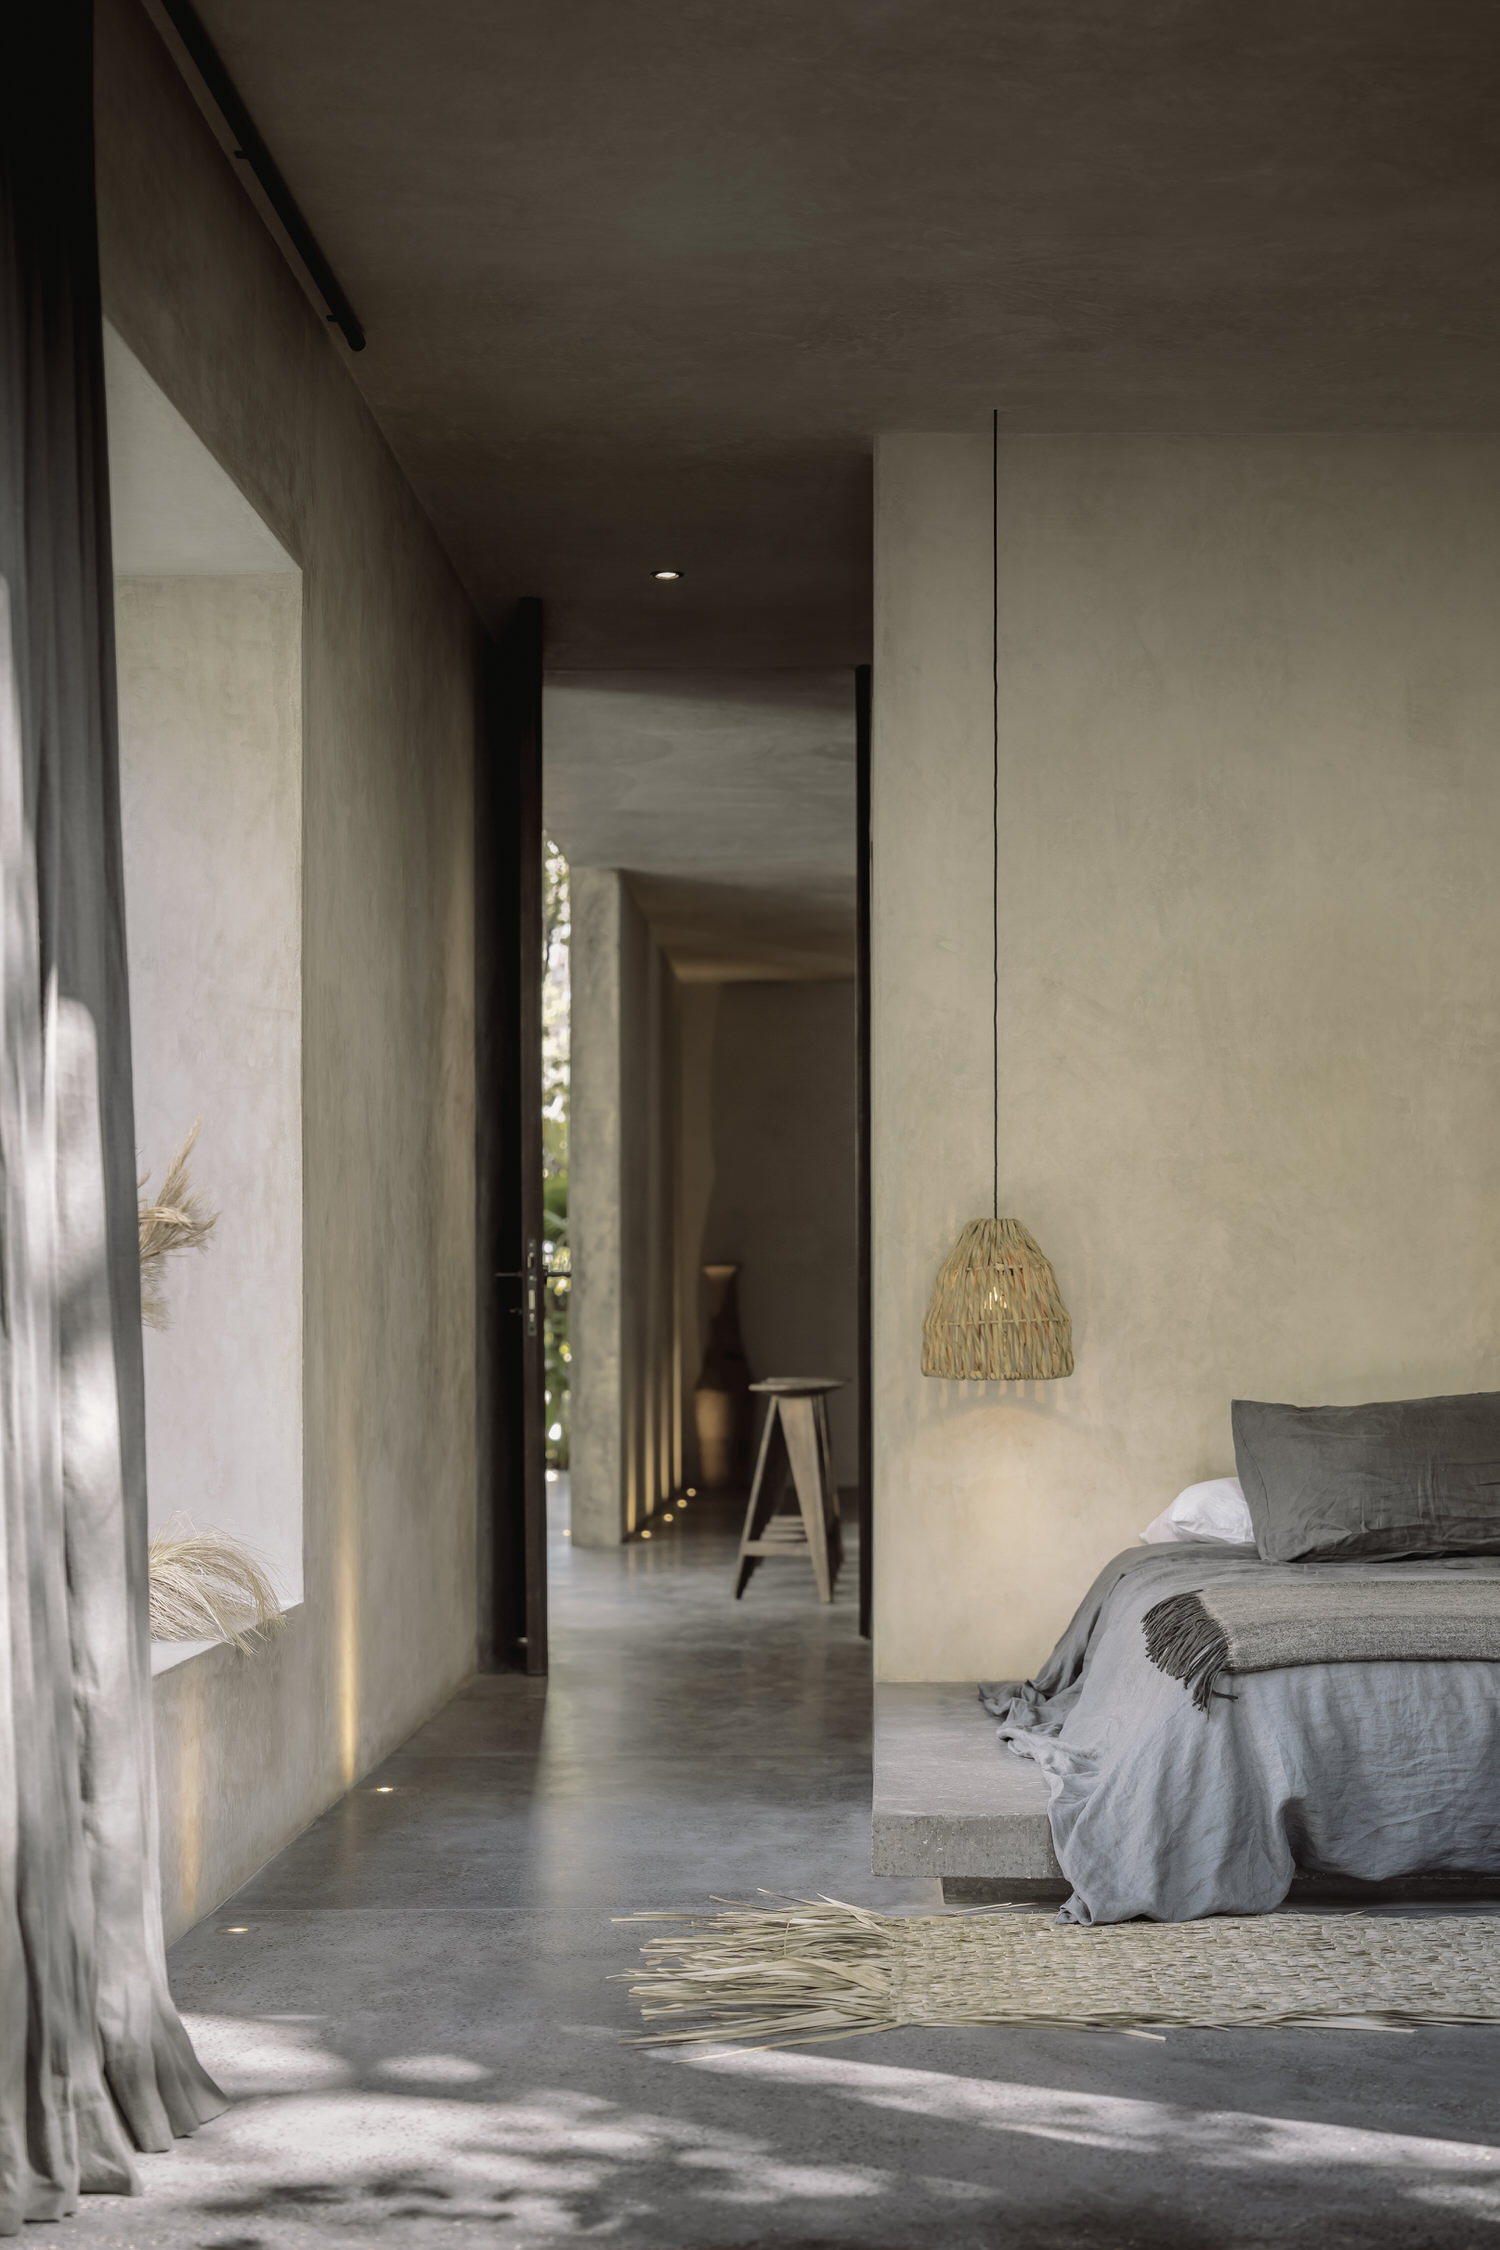 Co Lab Design Office Aviv House Tulum Mexico Arxhitecture Photo Cesar Bejar Yellowtrace 20